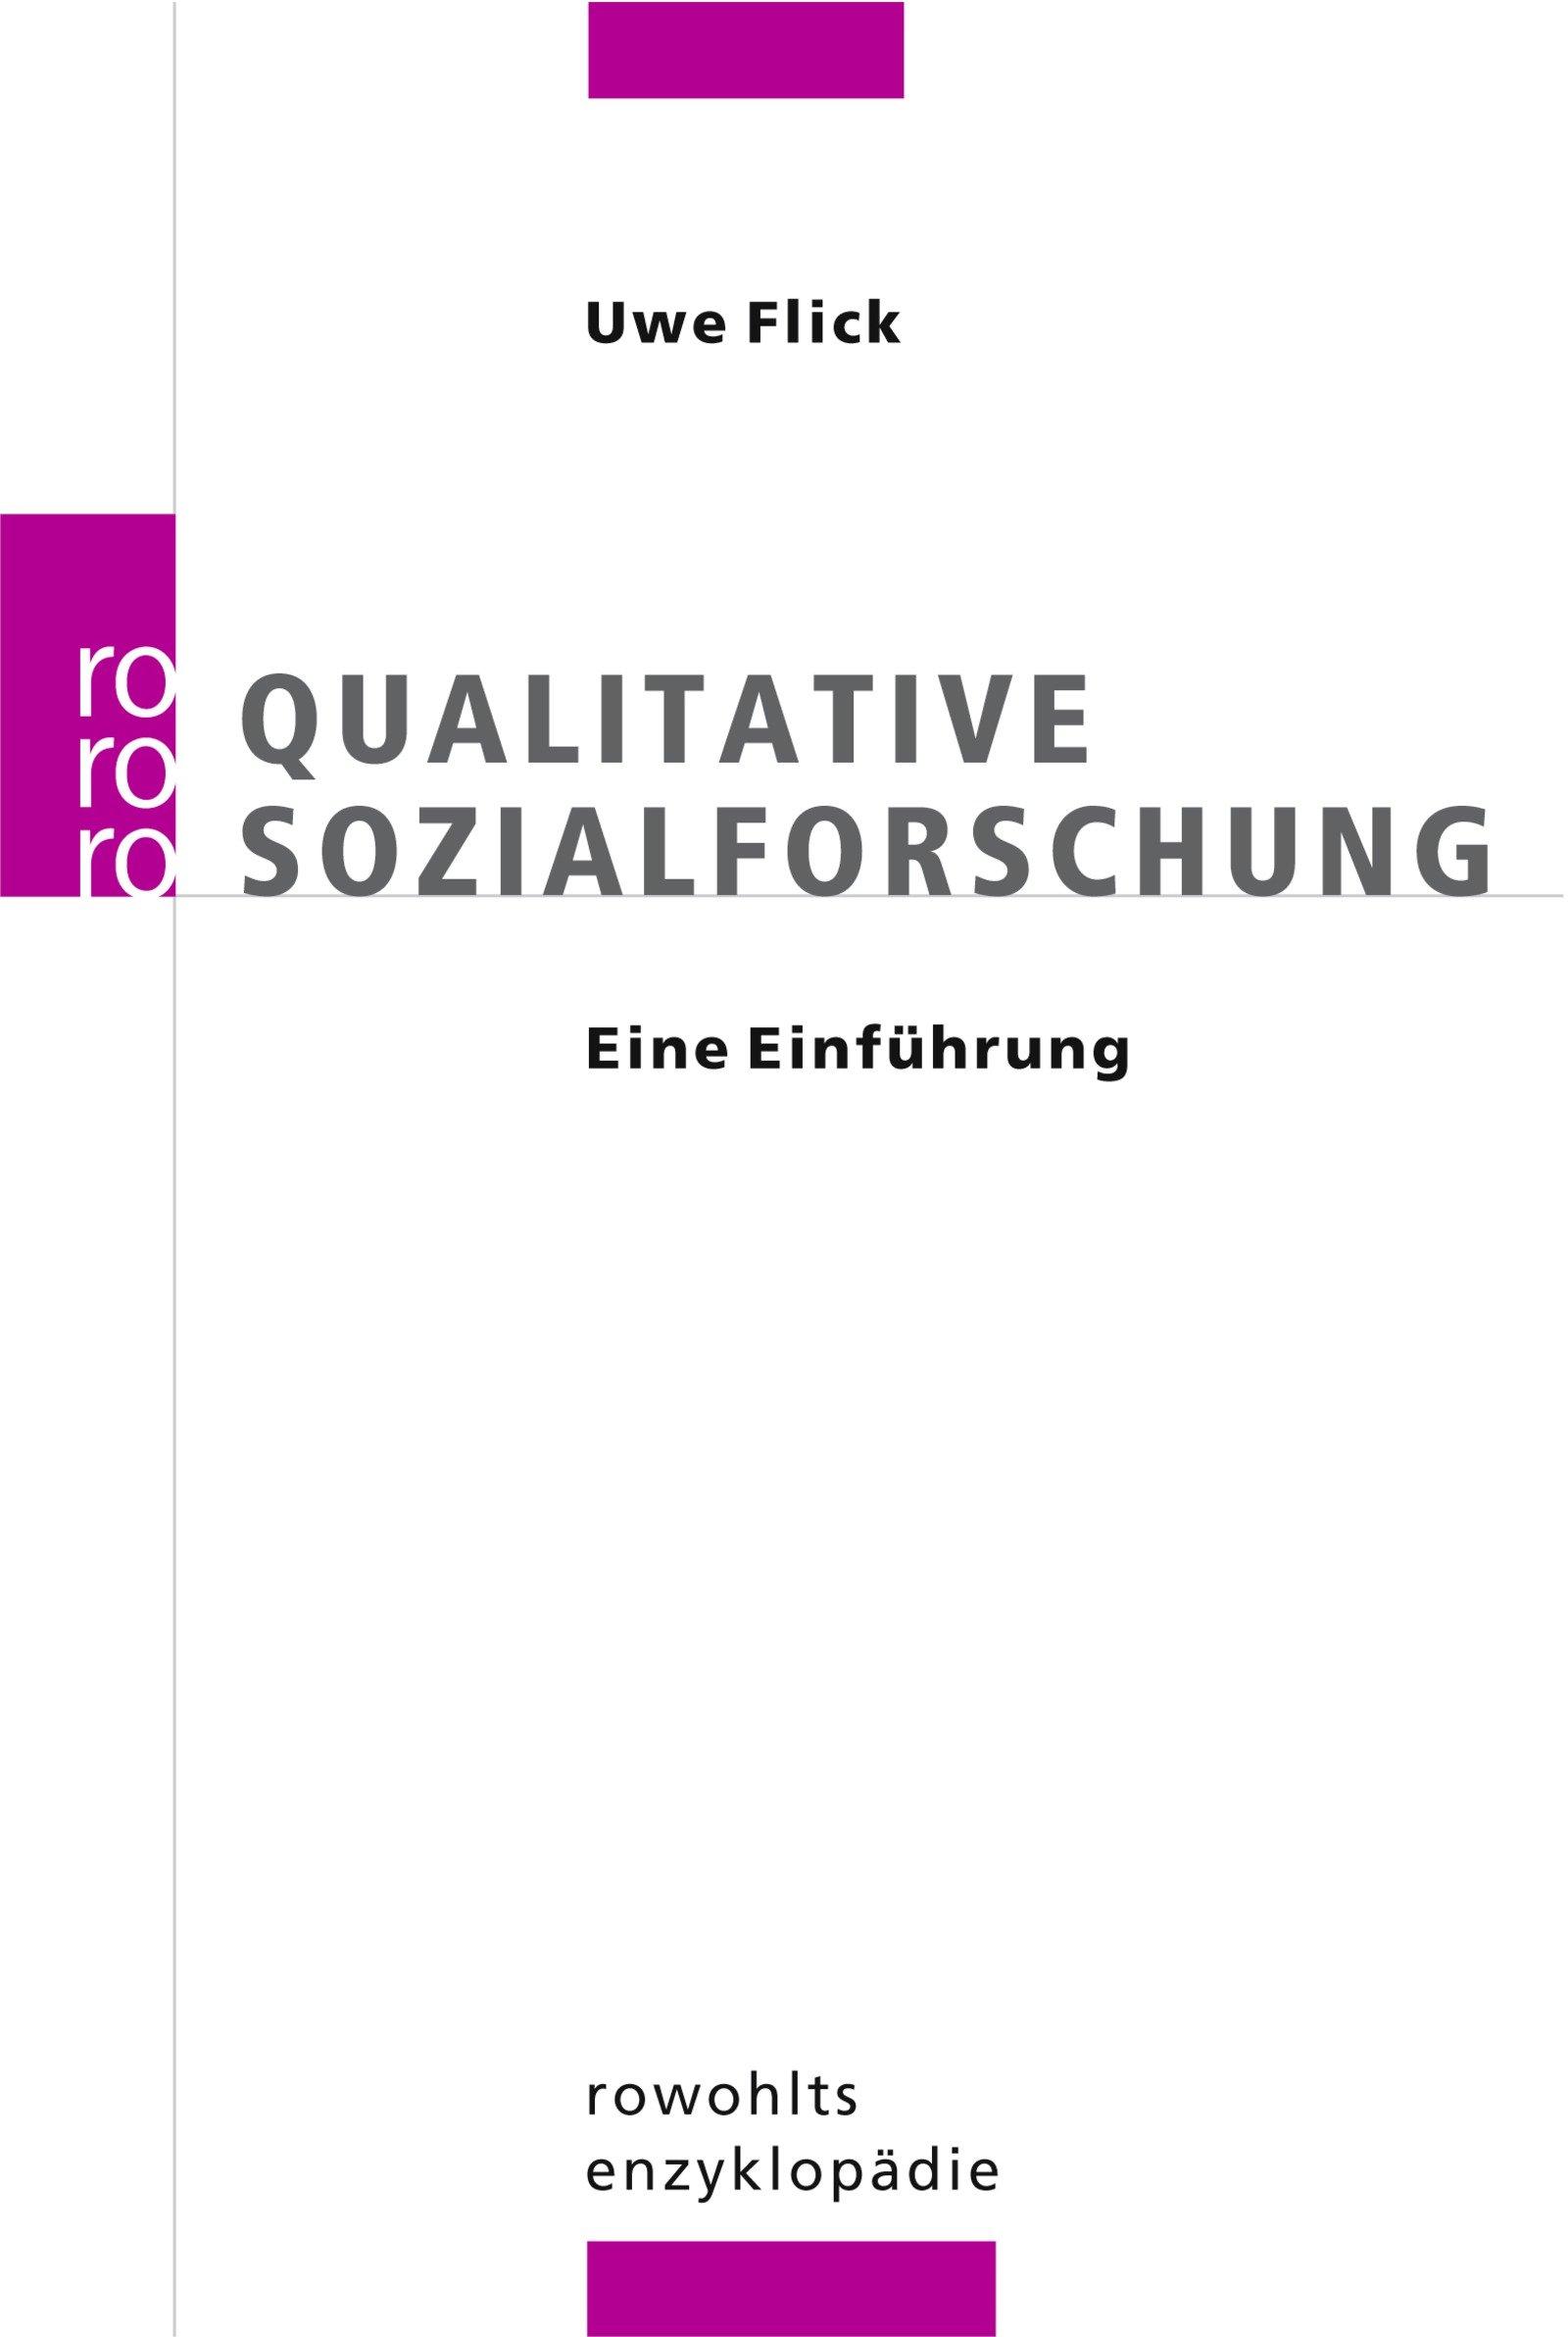 Qualitative sozialforschung entscheidungsproblem bwl